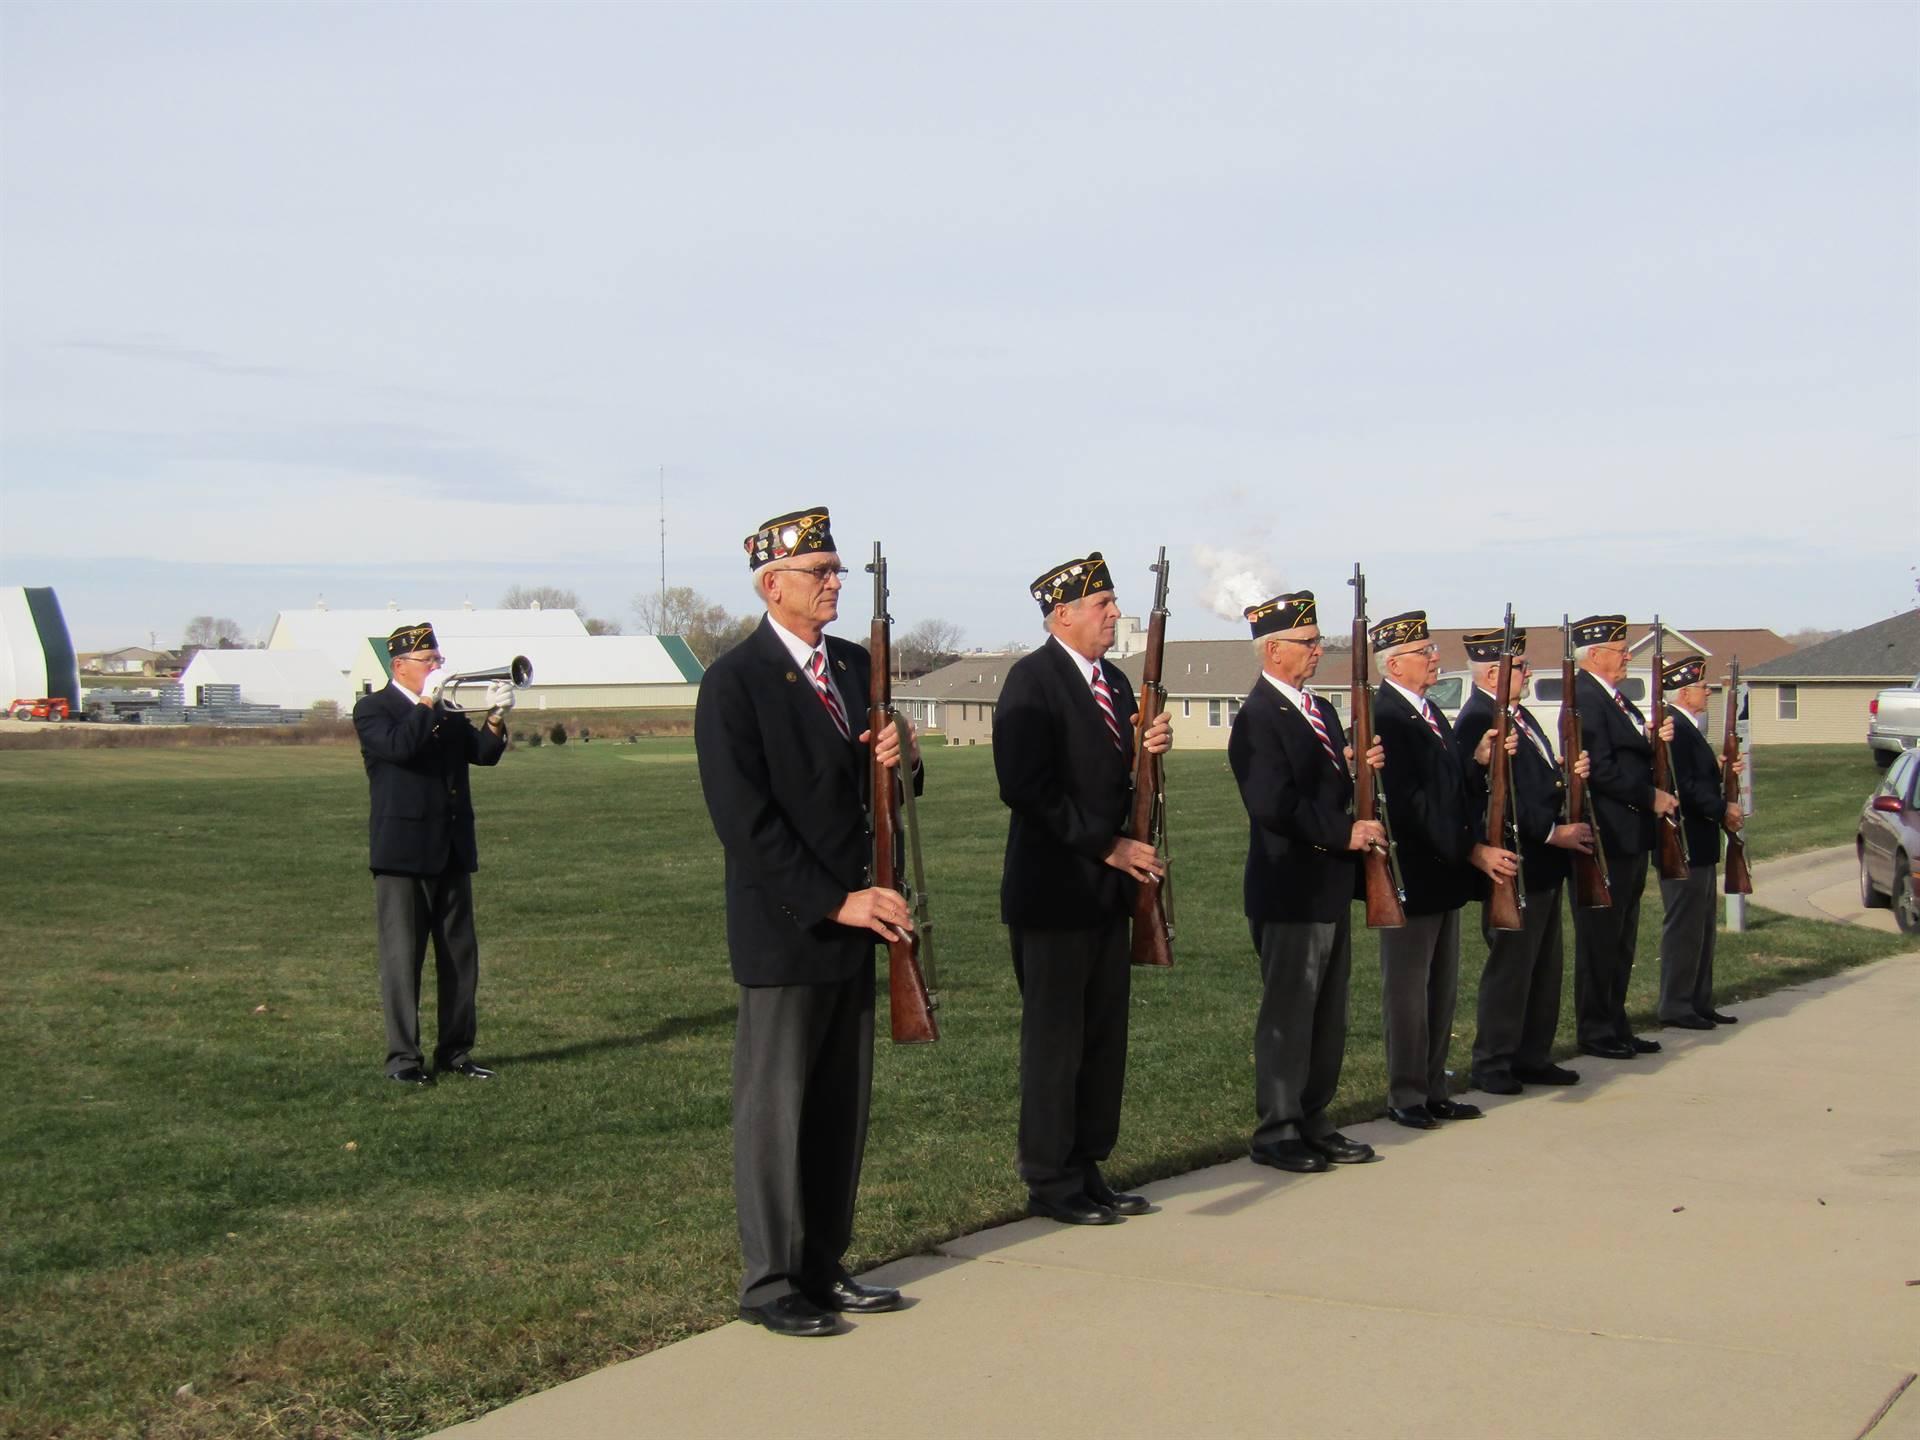 21 gun salute at Veterans' Day program.